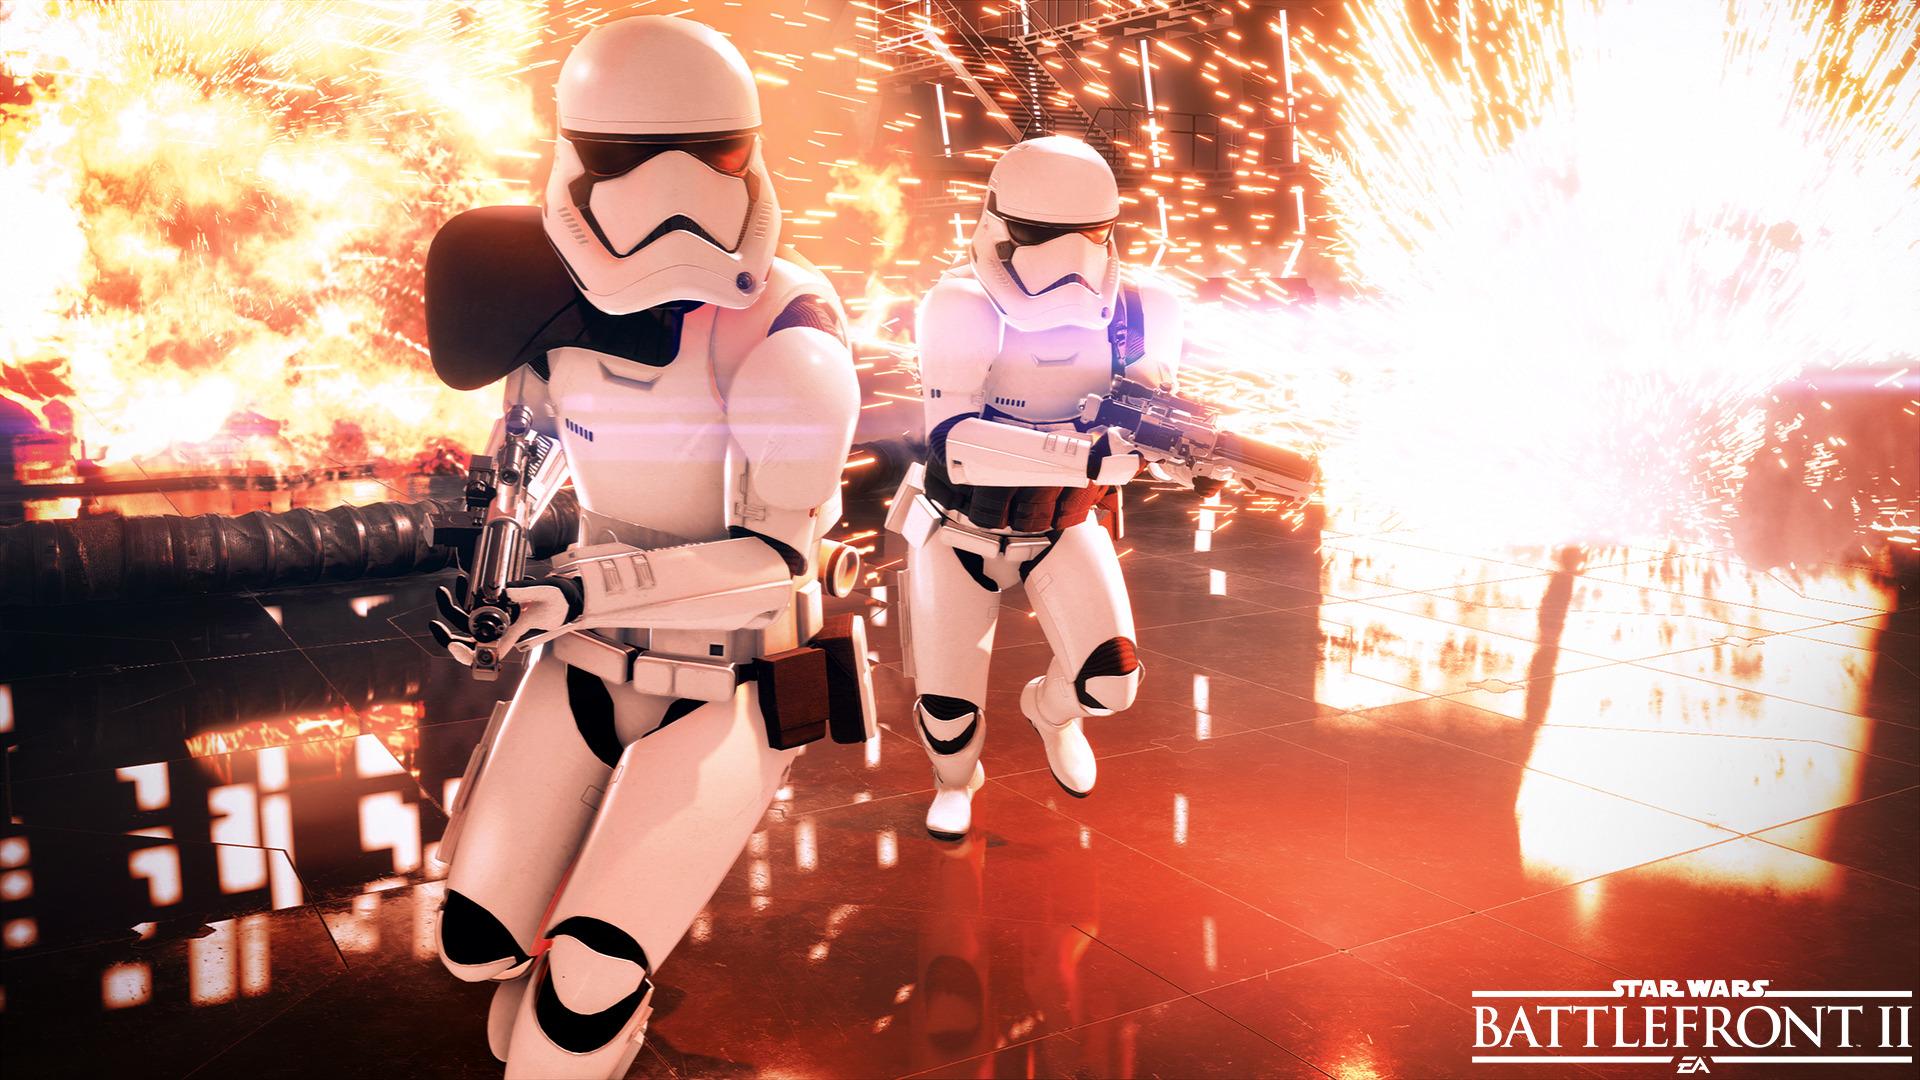 Prometidas melhores recompensas em Star Wars Battlefront II